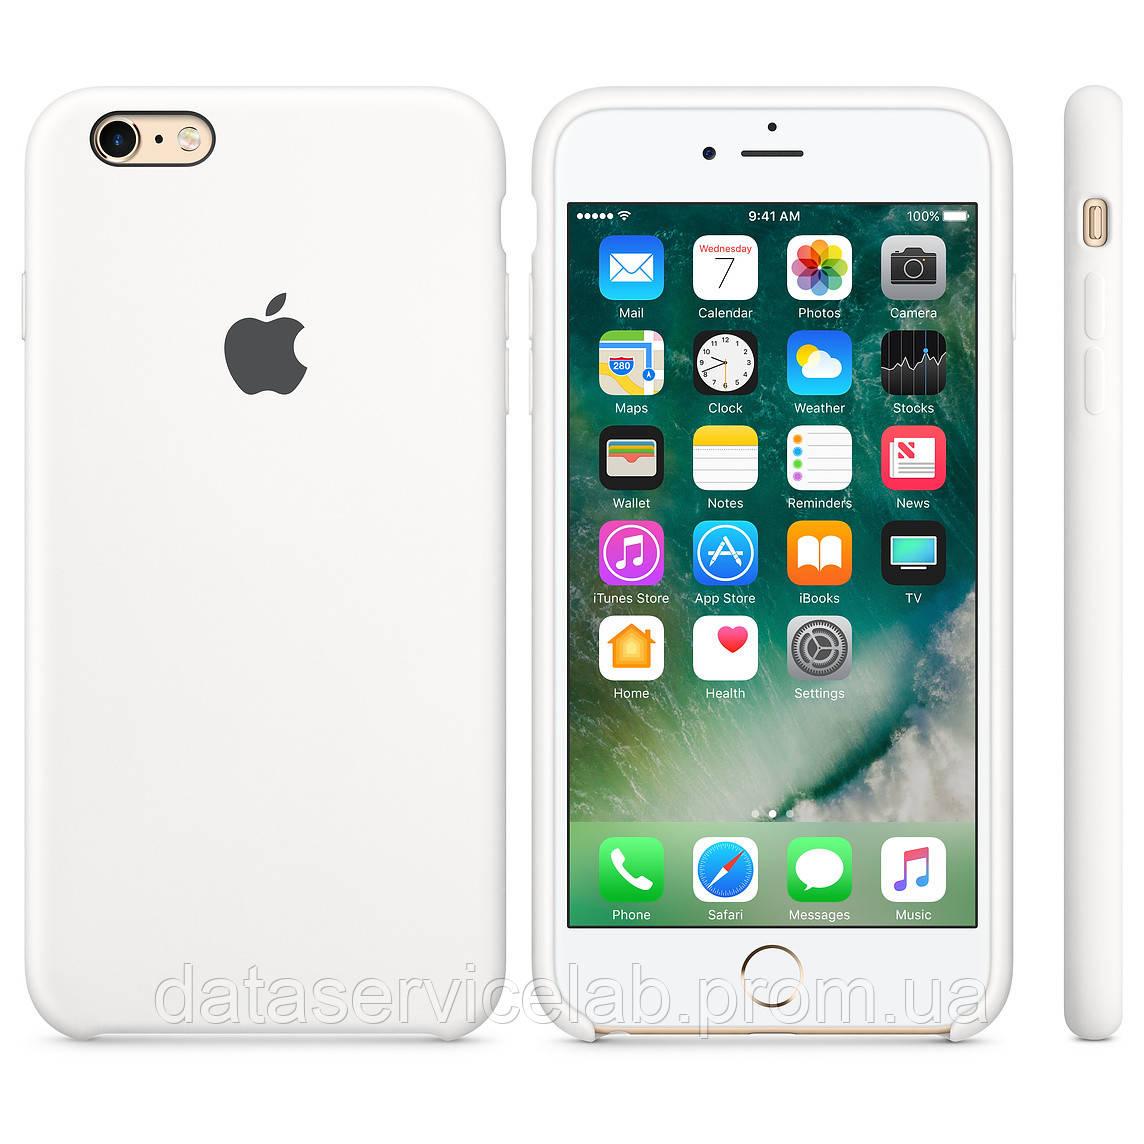 Чохол накладка для iPhone 6/6S Silicone Case White